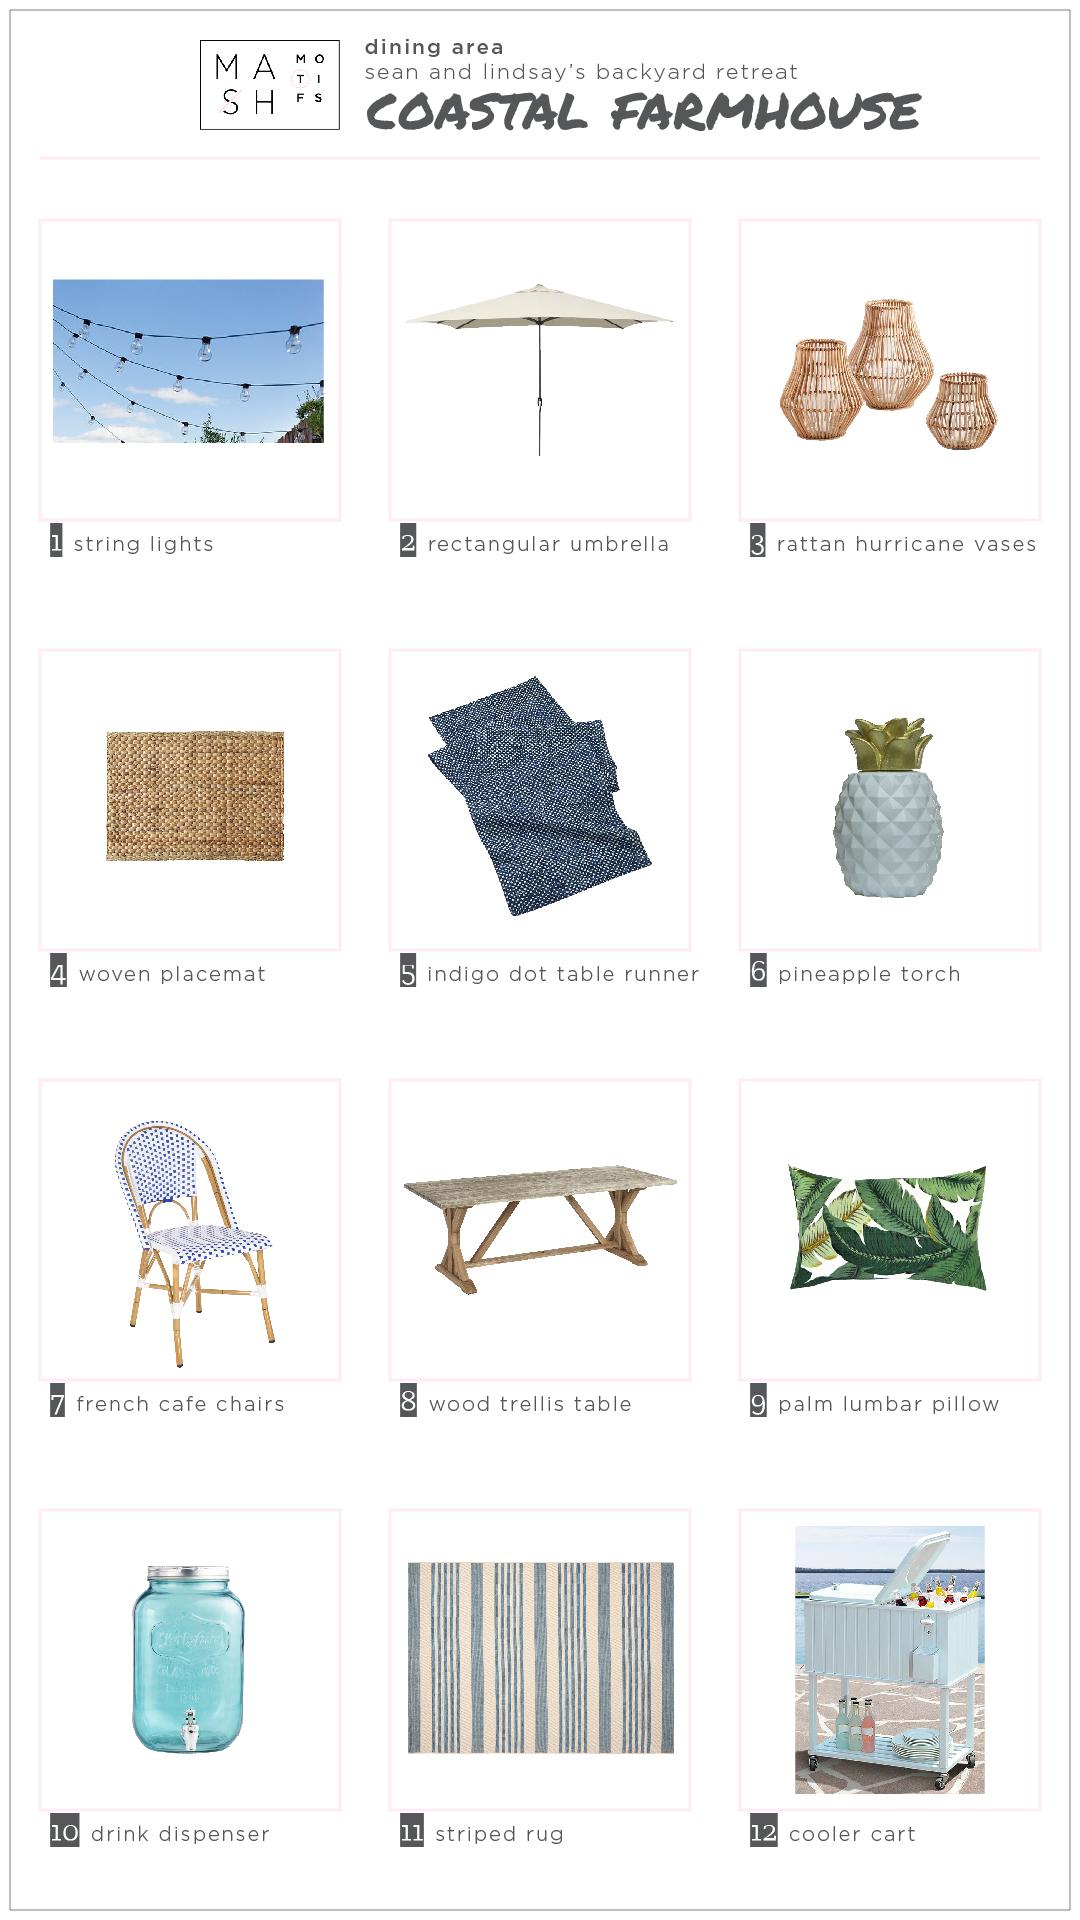 Dining area items.jpg